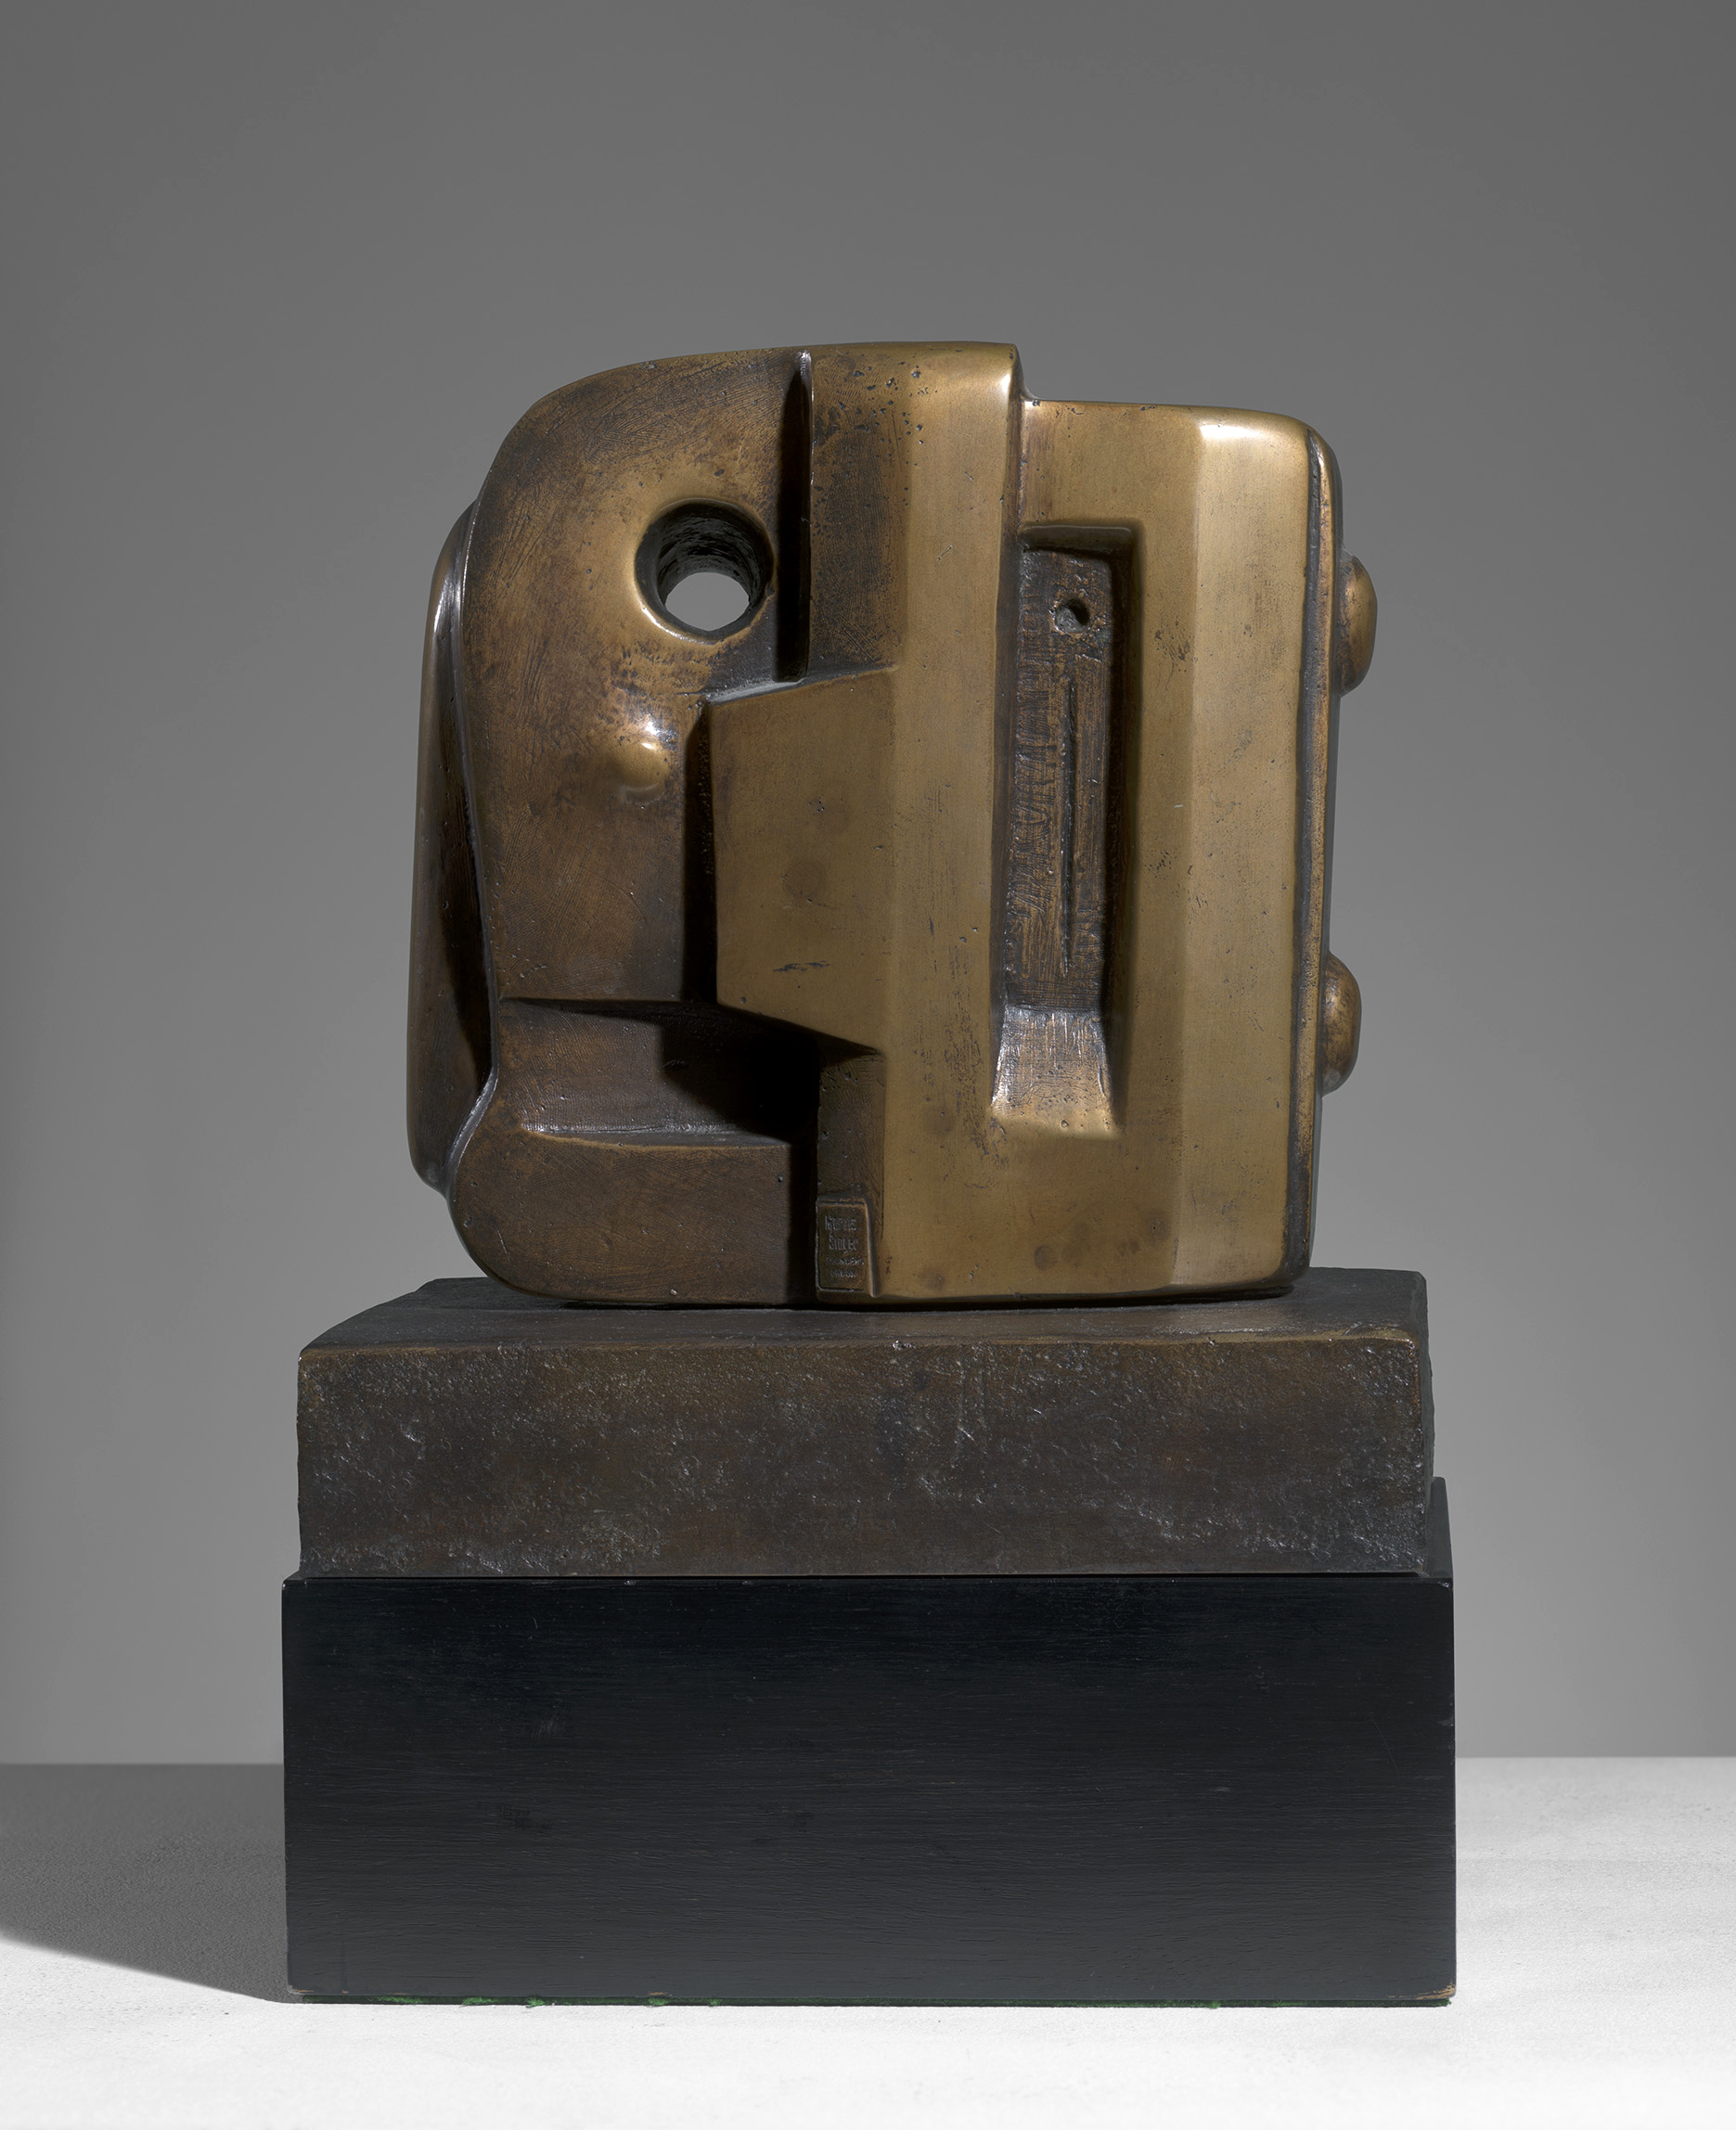 Square Form, Head